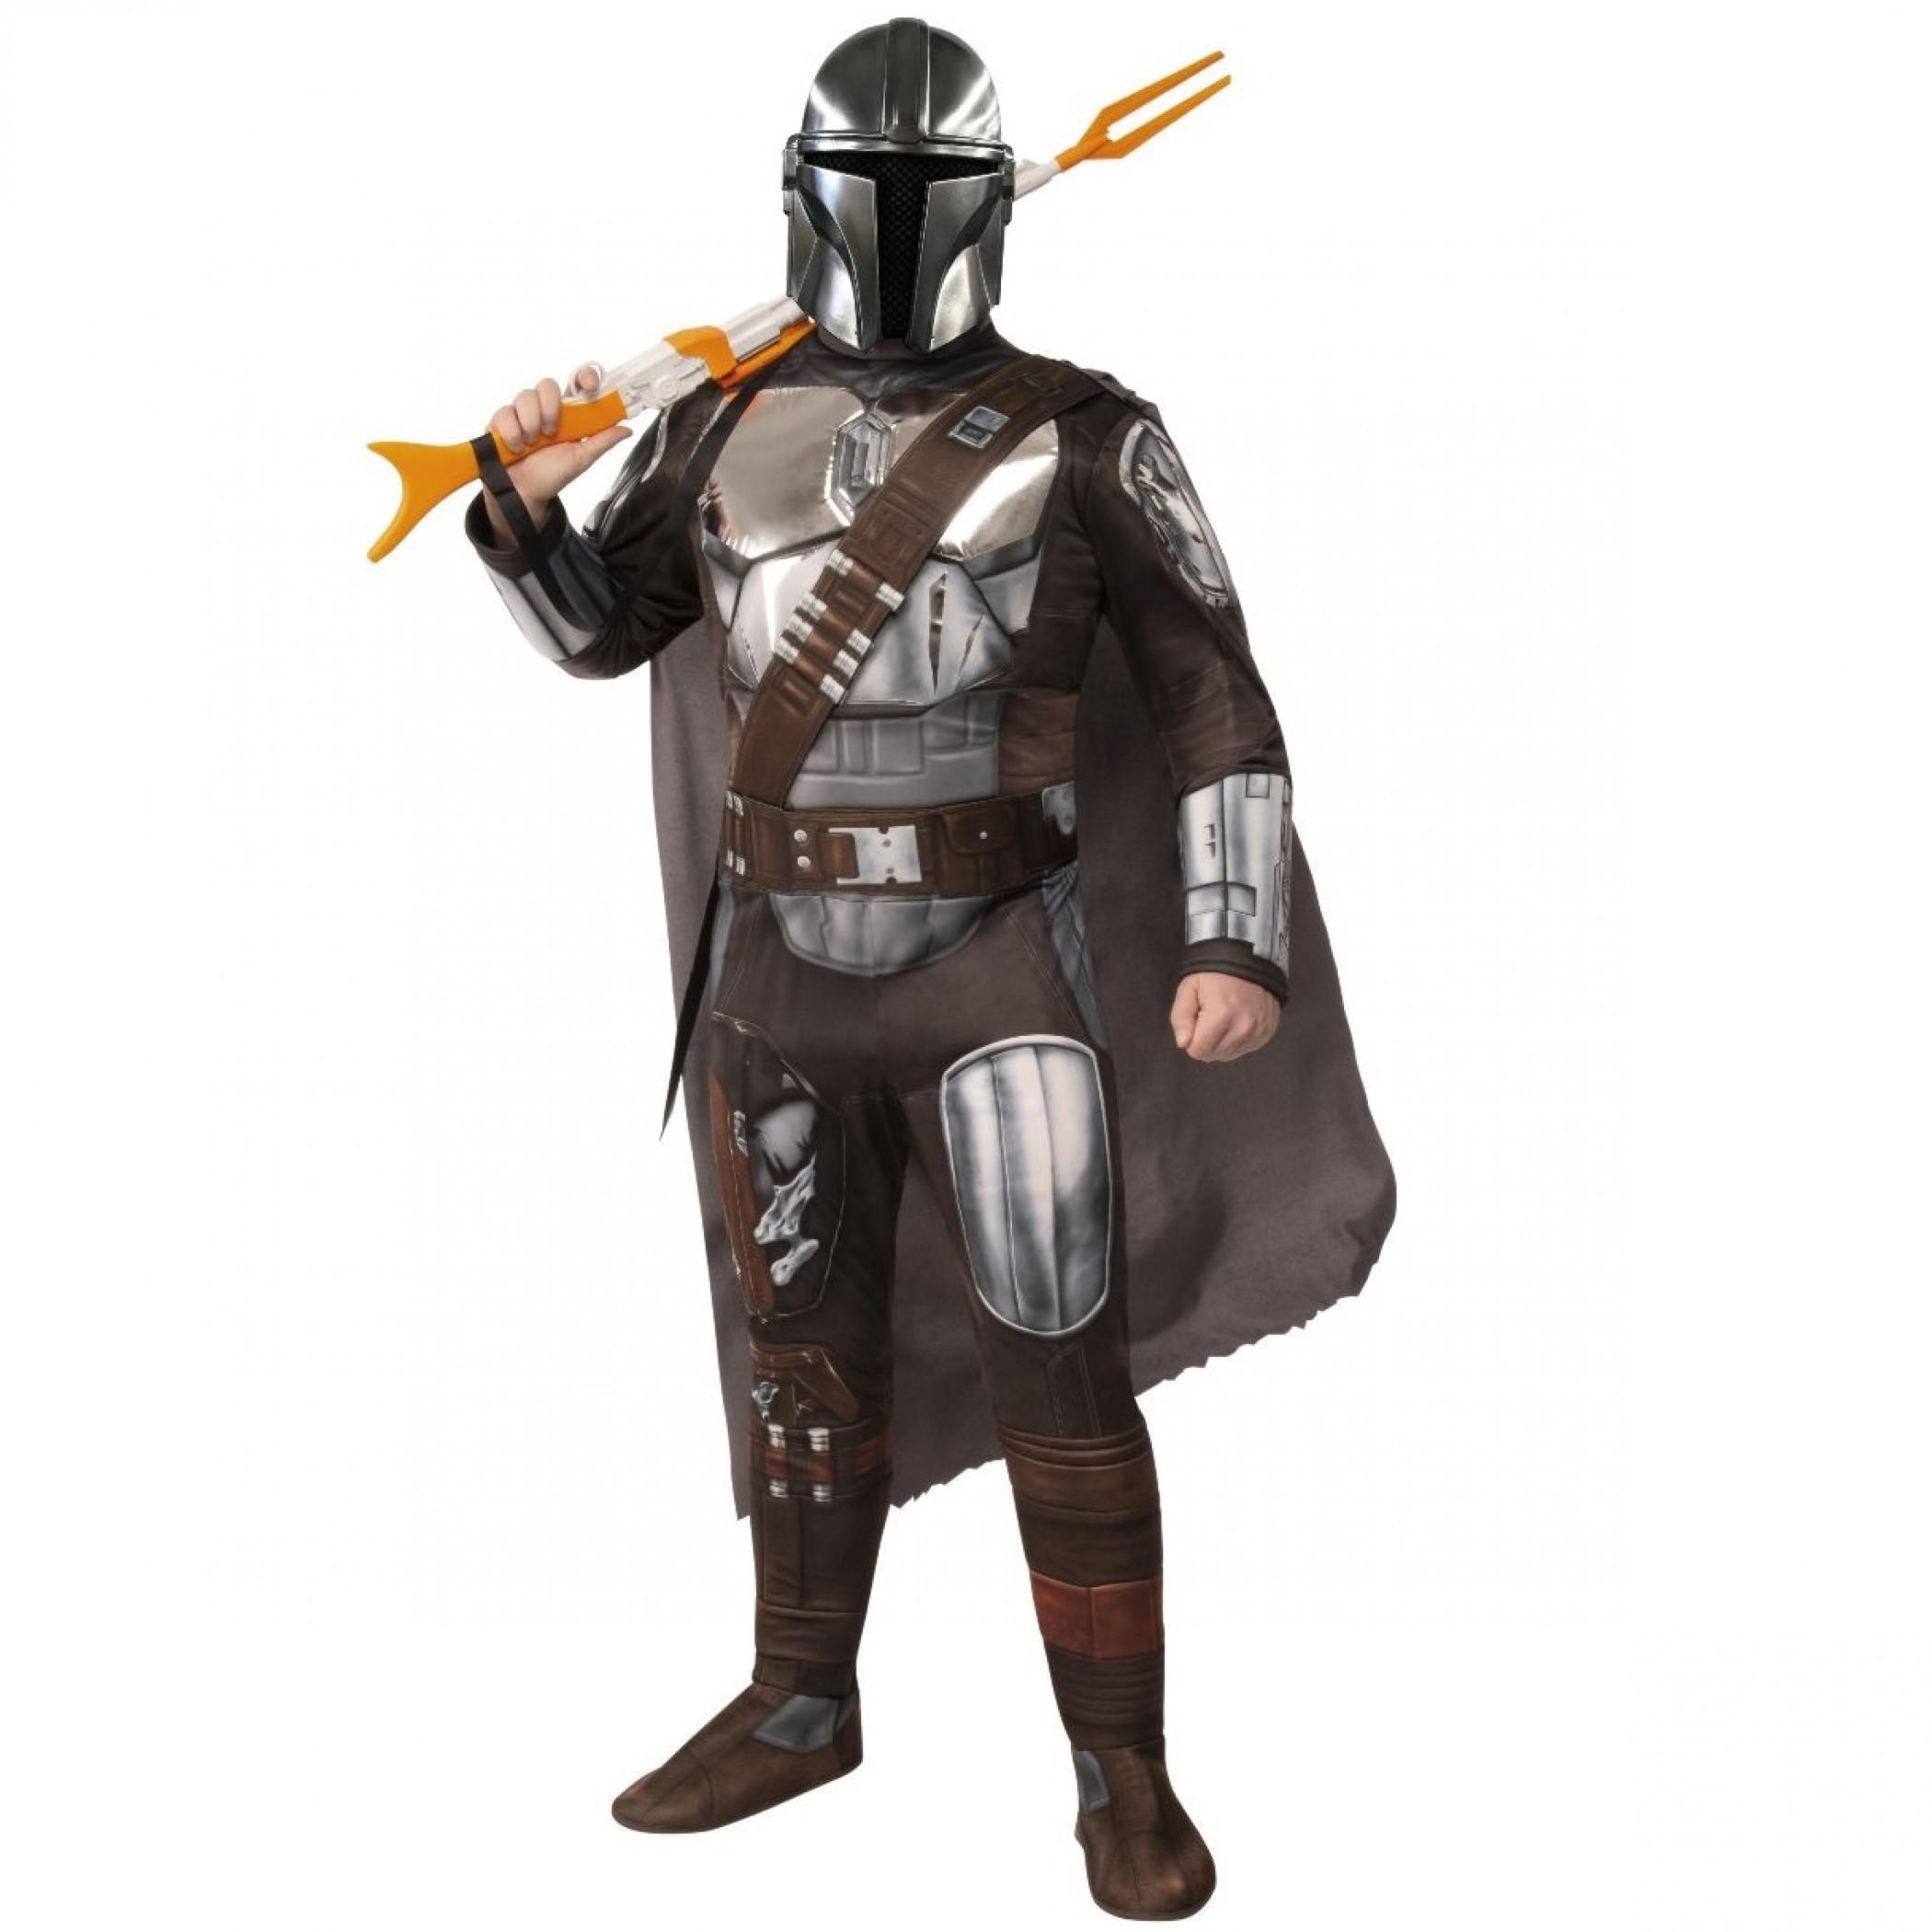 Star Wars The Mandalorian Beskar Adult Costume